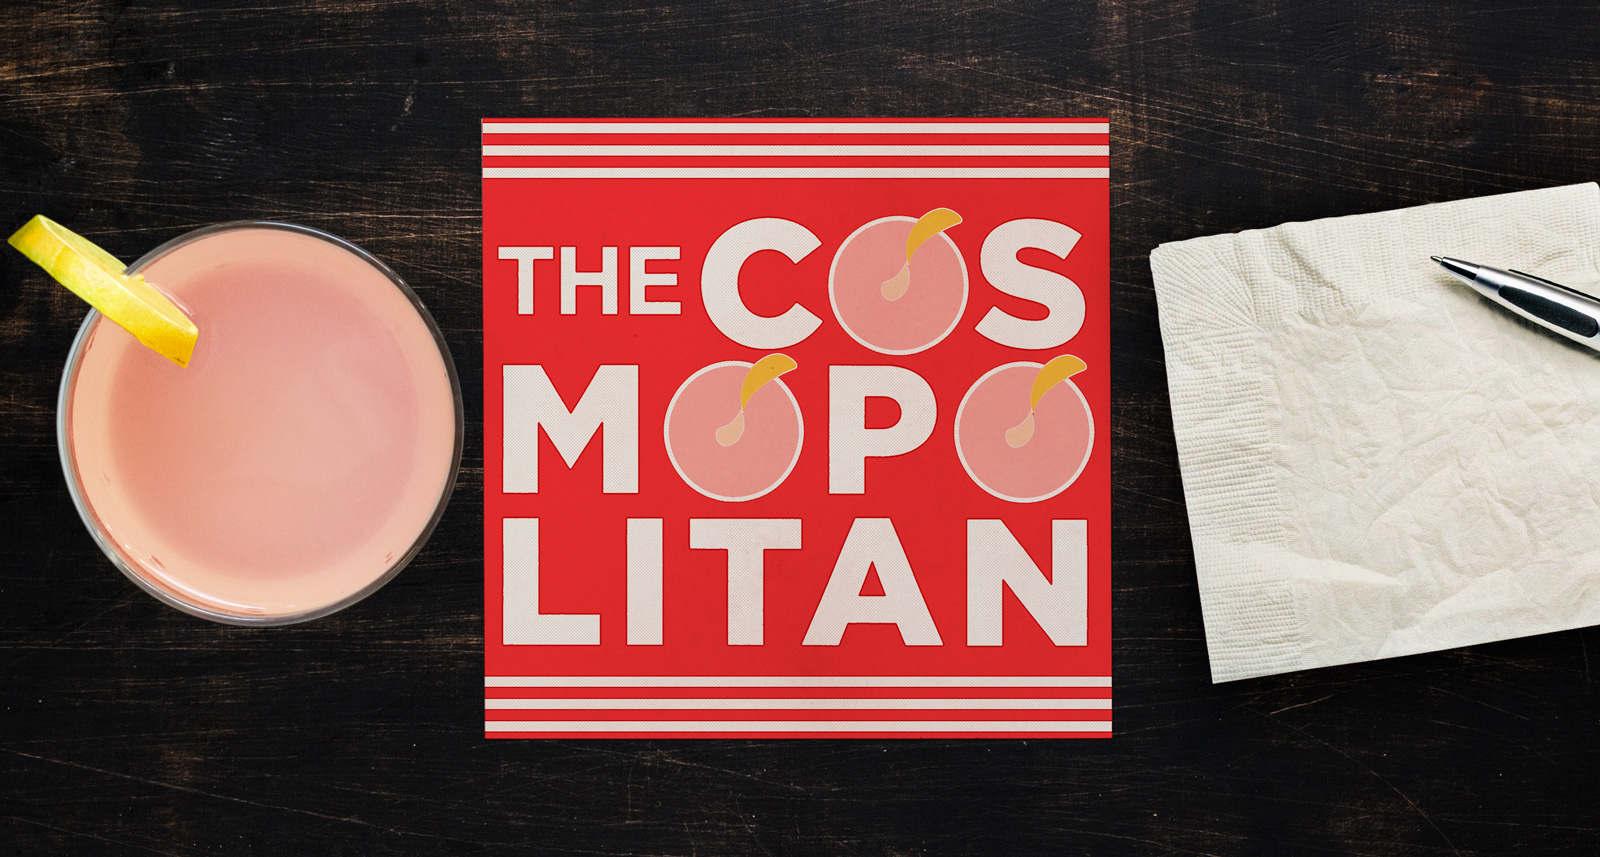 Cosmopolitan hook up tips